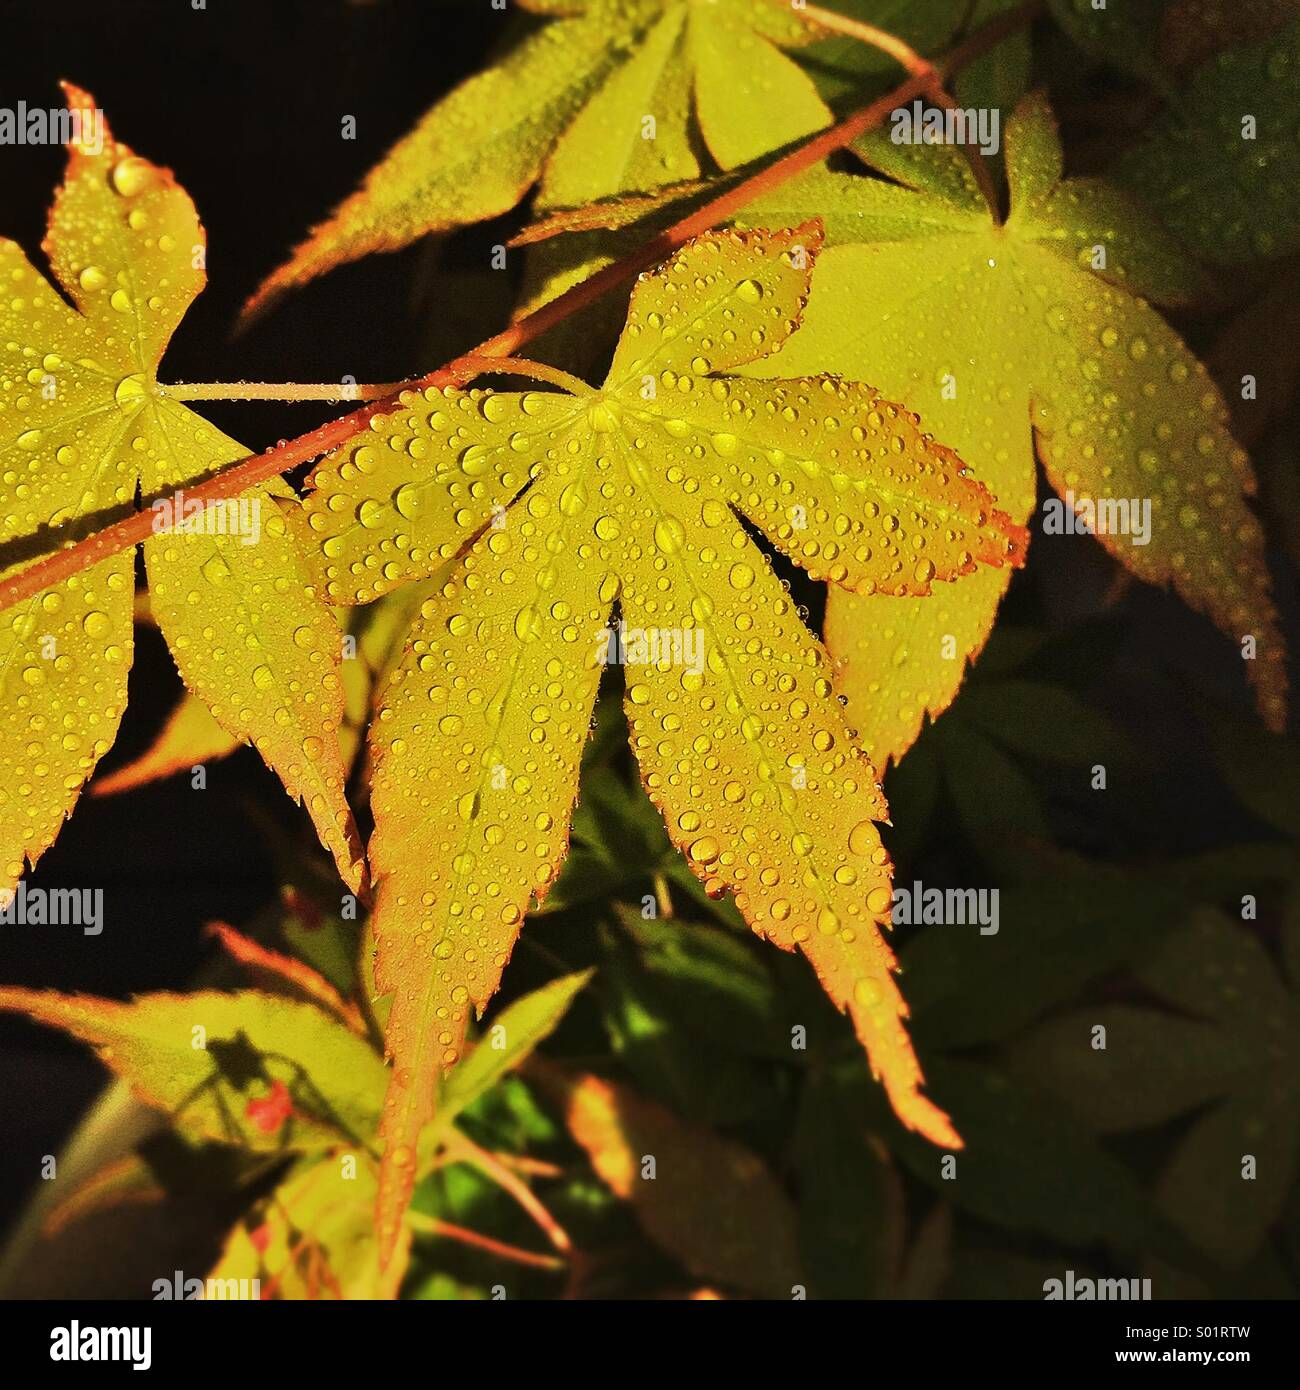 Japanese maple wet leaves. Acer japonicum leaf. - Stock Image